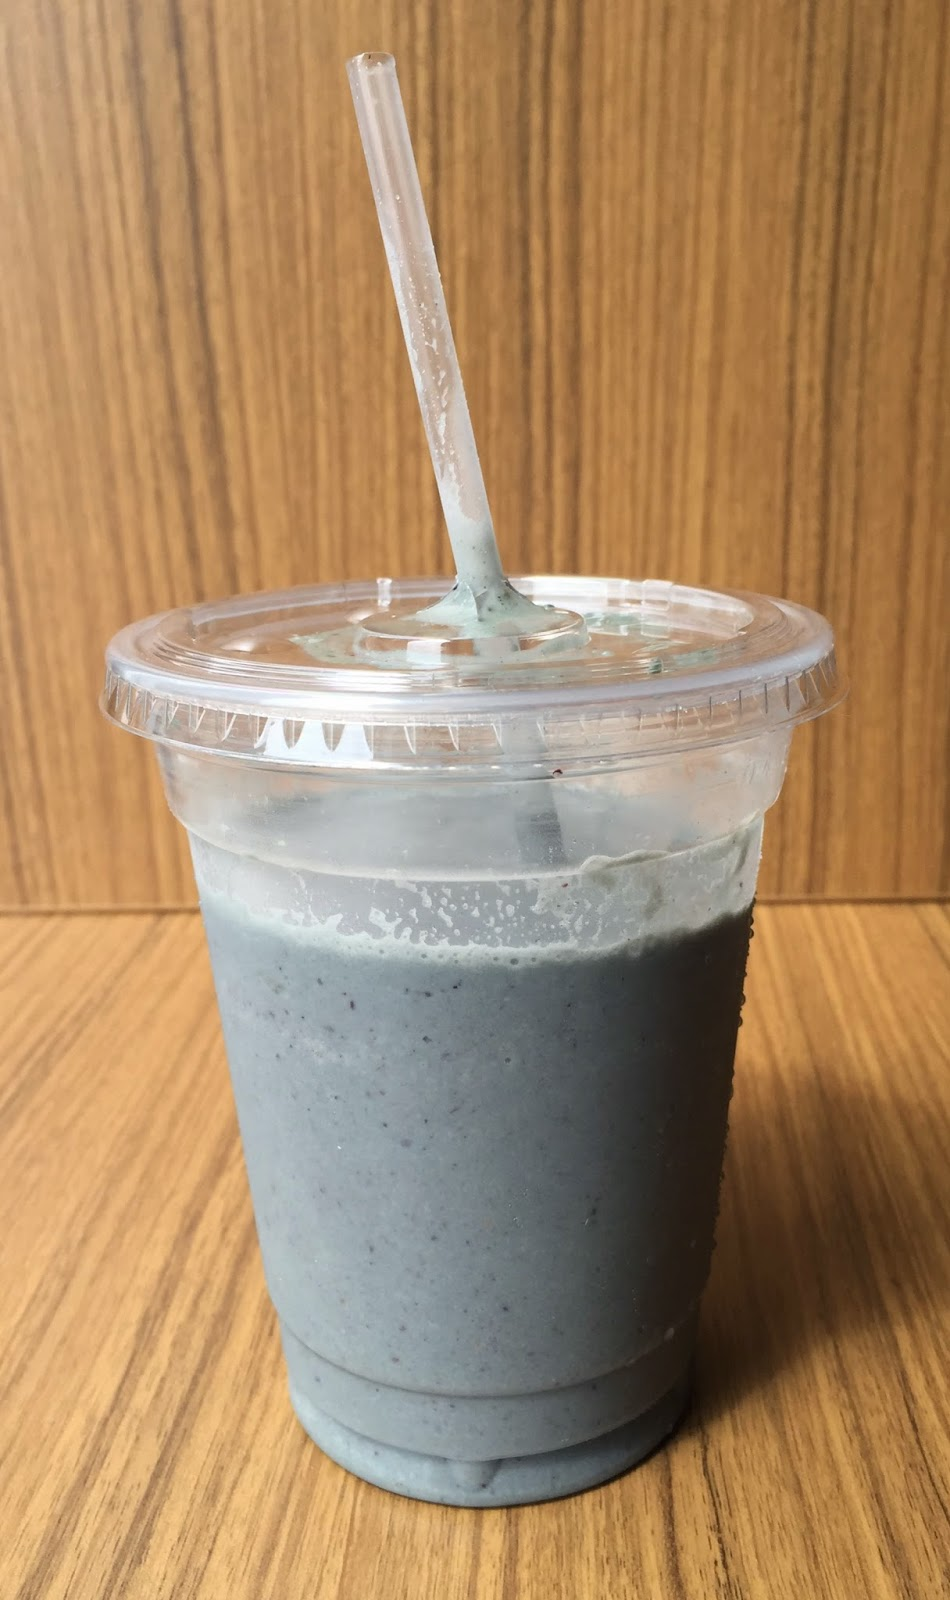 Grey Hulk Smoothie - Luna's Living Kitchen Hemp Protein Veega Vegan